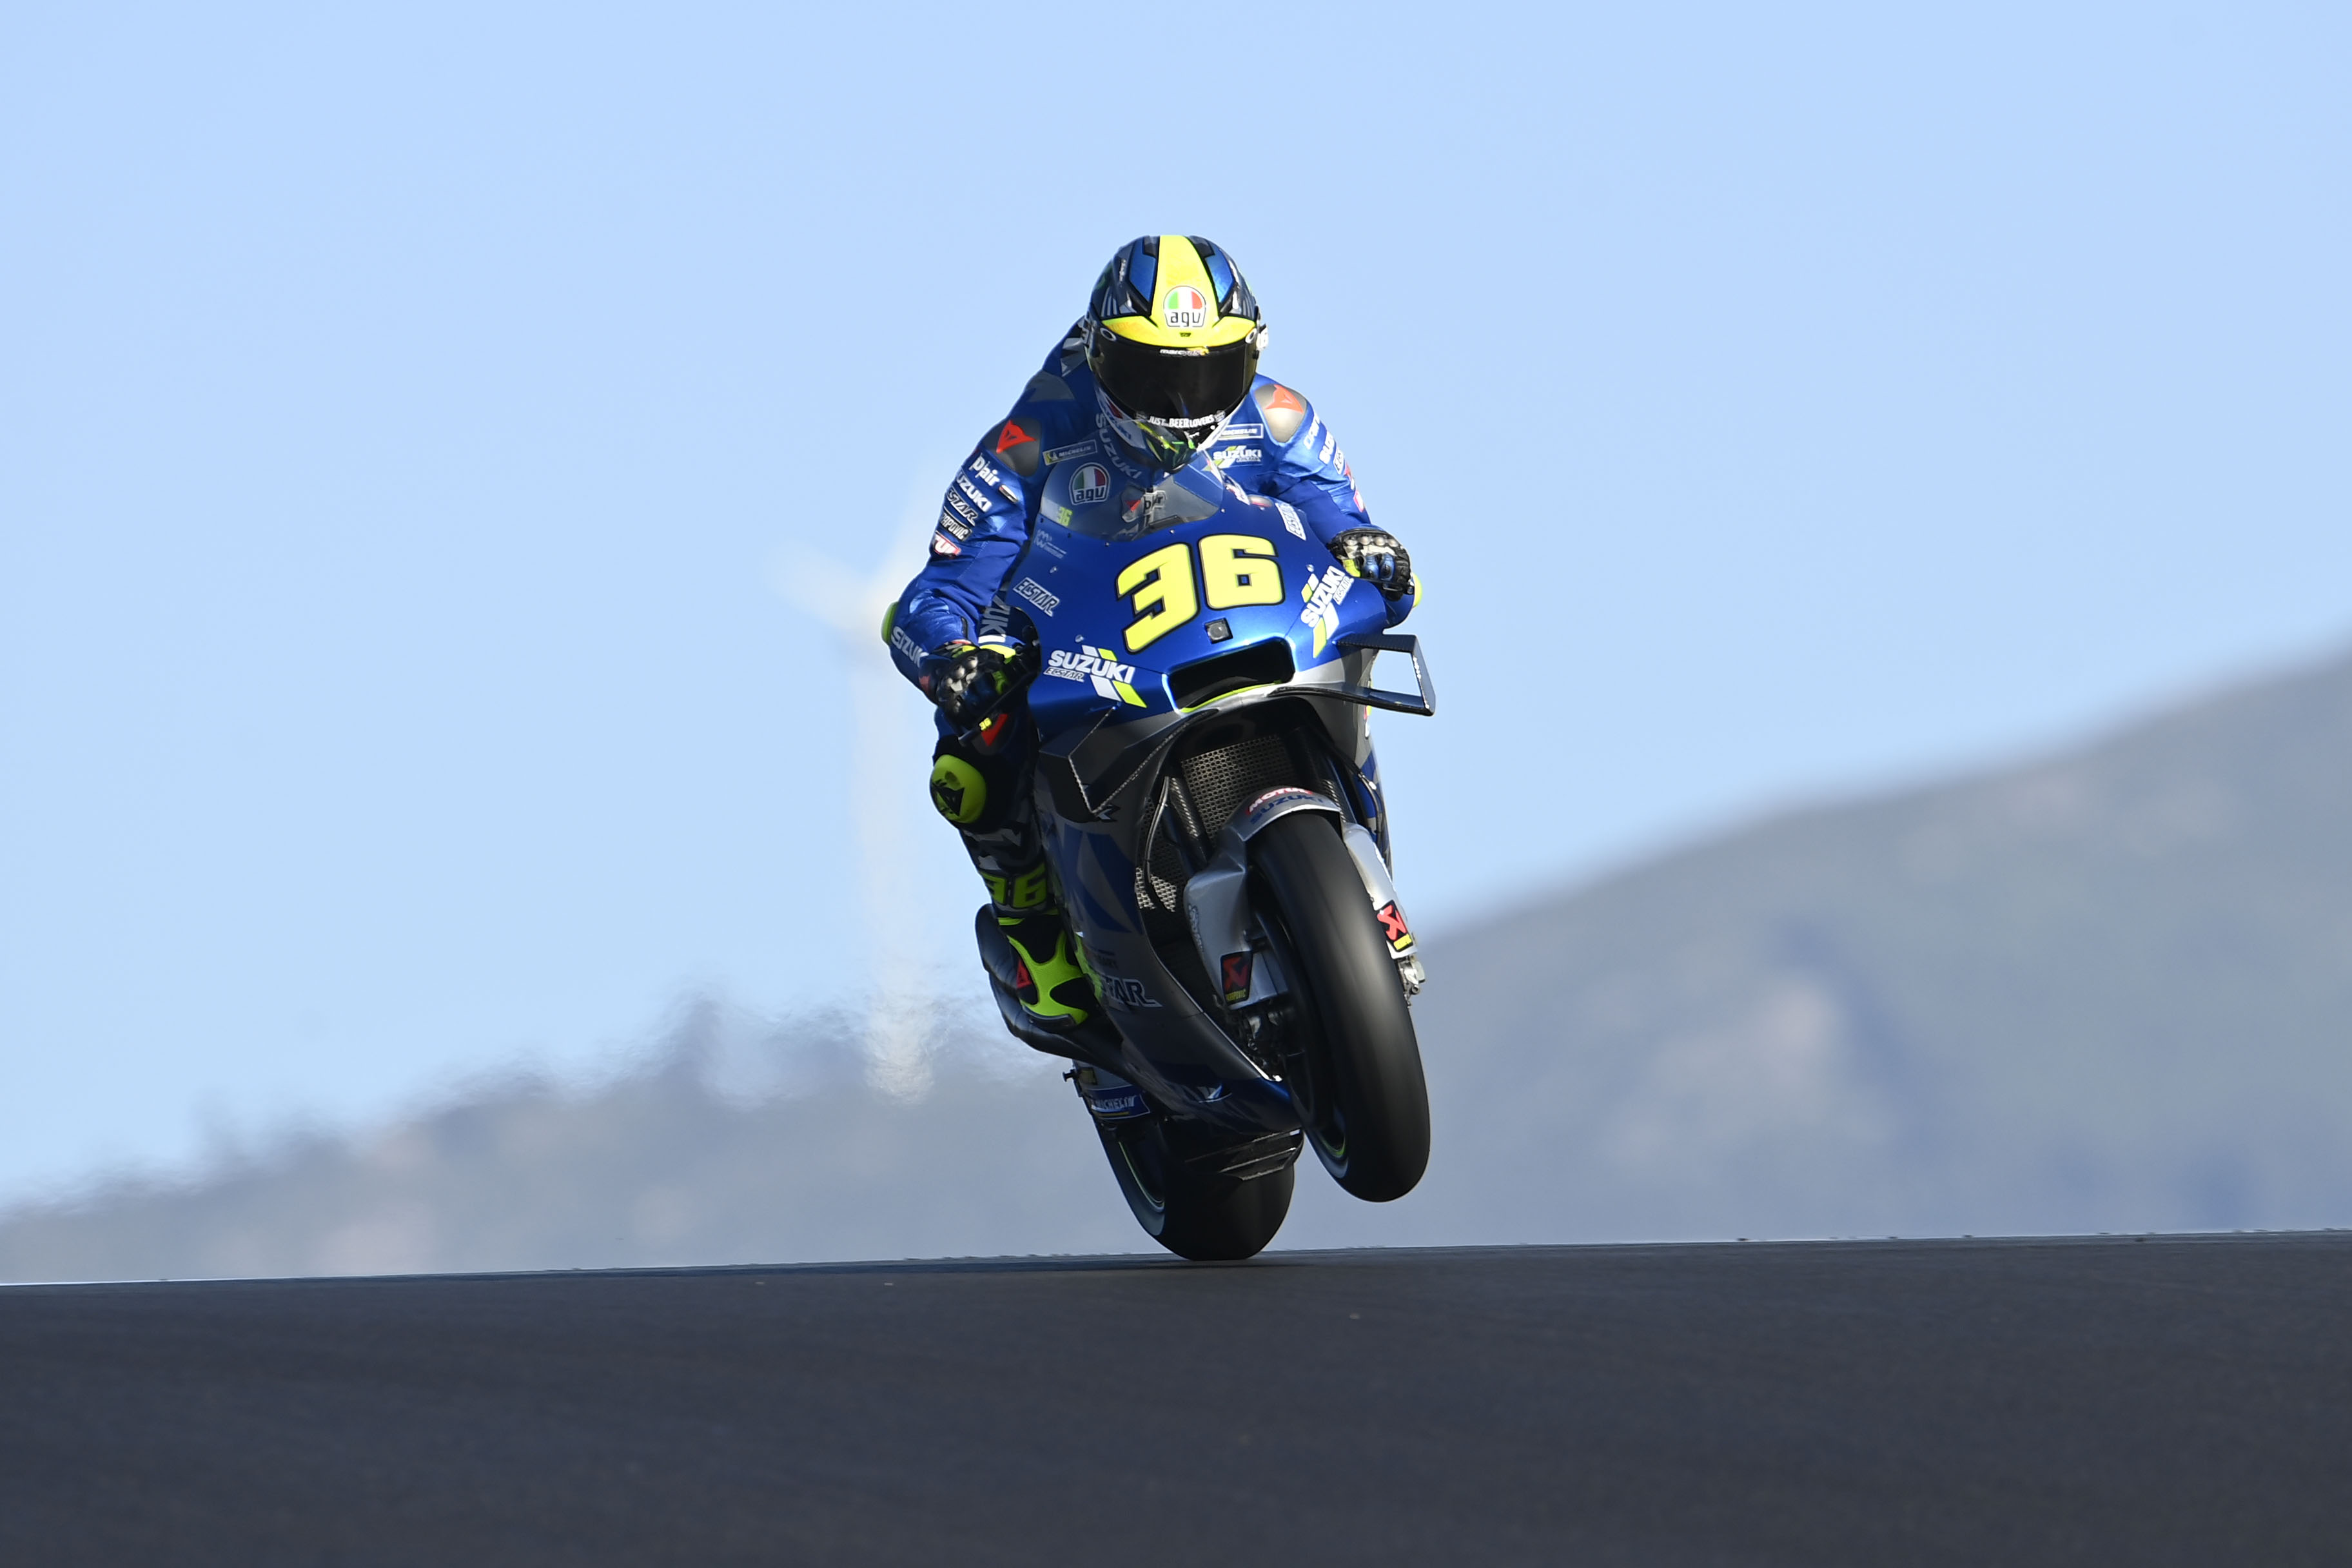 Joan Mir, Suzuki, Portimao MotoGP